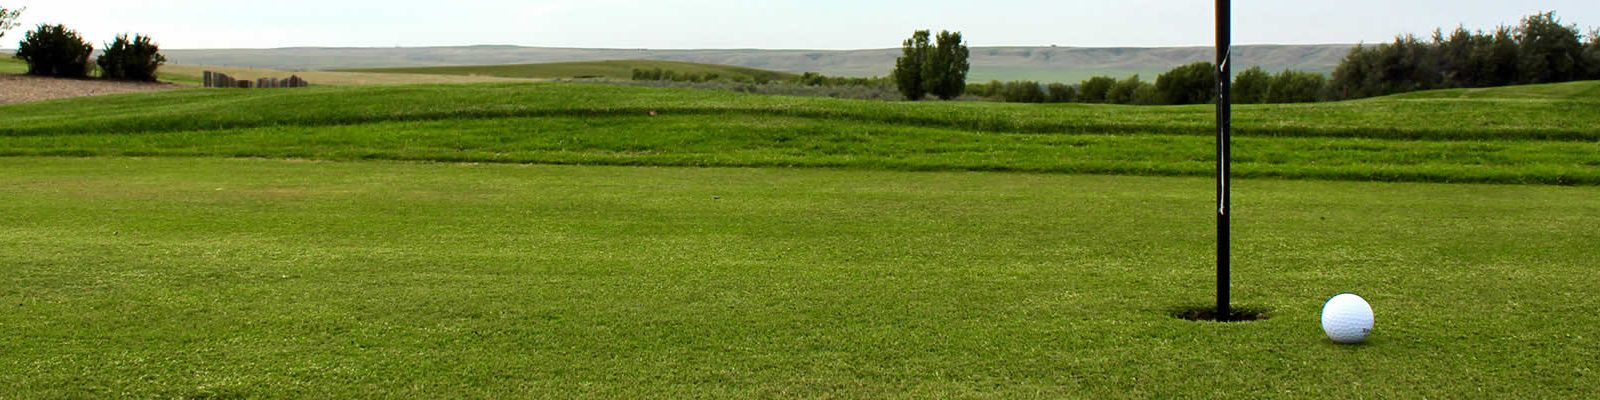 River Ridge Golf Club - On the Green